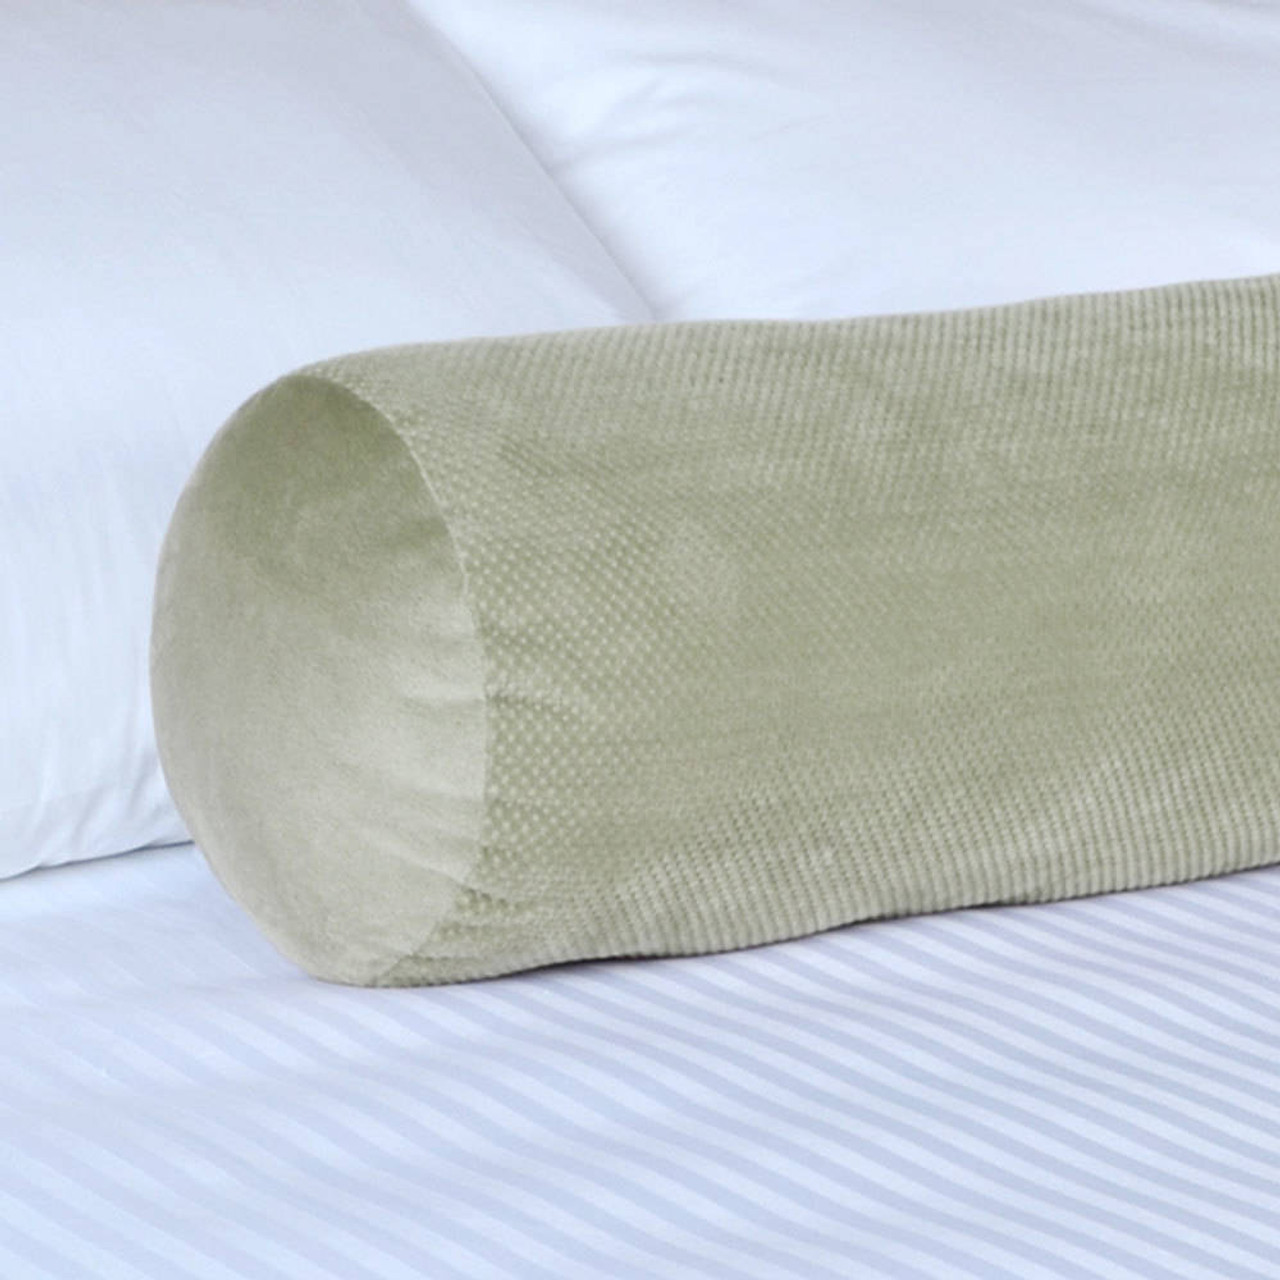 Berkshire Blankets BERKSHIRE or OPULENCE DOBBY MINK or DECORATIVE PILLOW